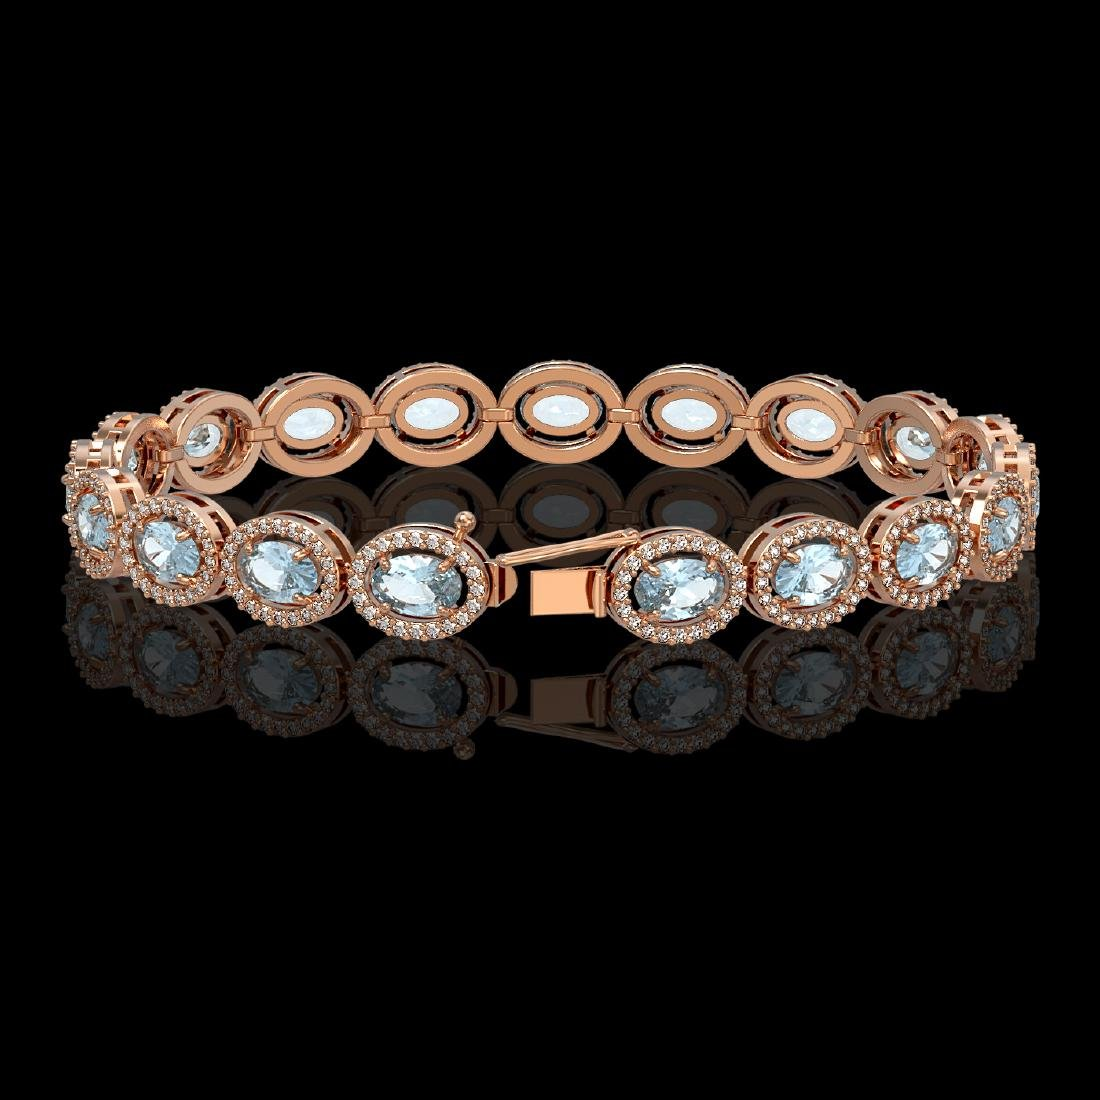 14.82 CTW Sky Topaz & Diamond Halo Bracelet 10K Rose - 2